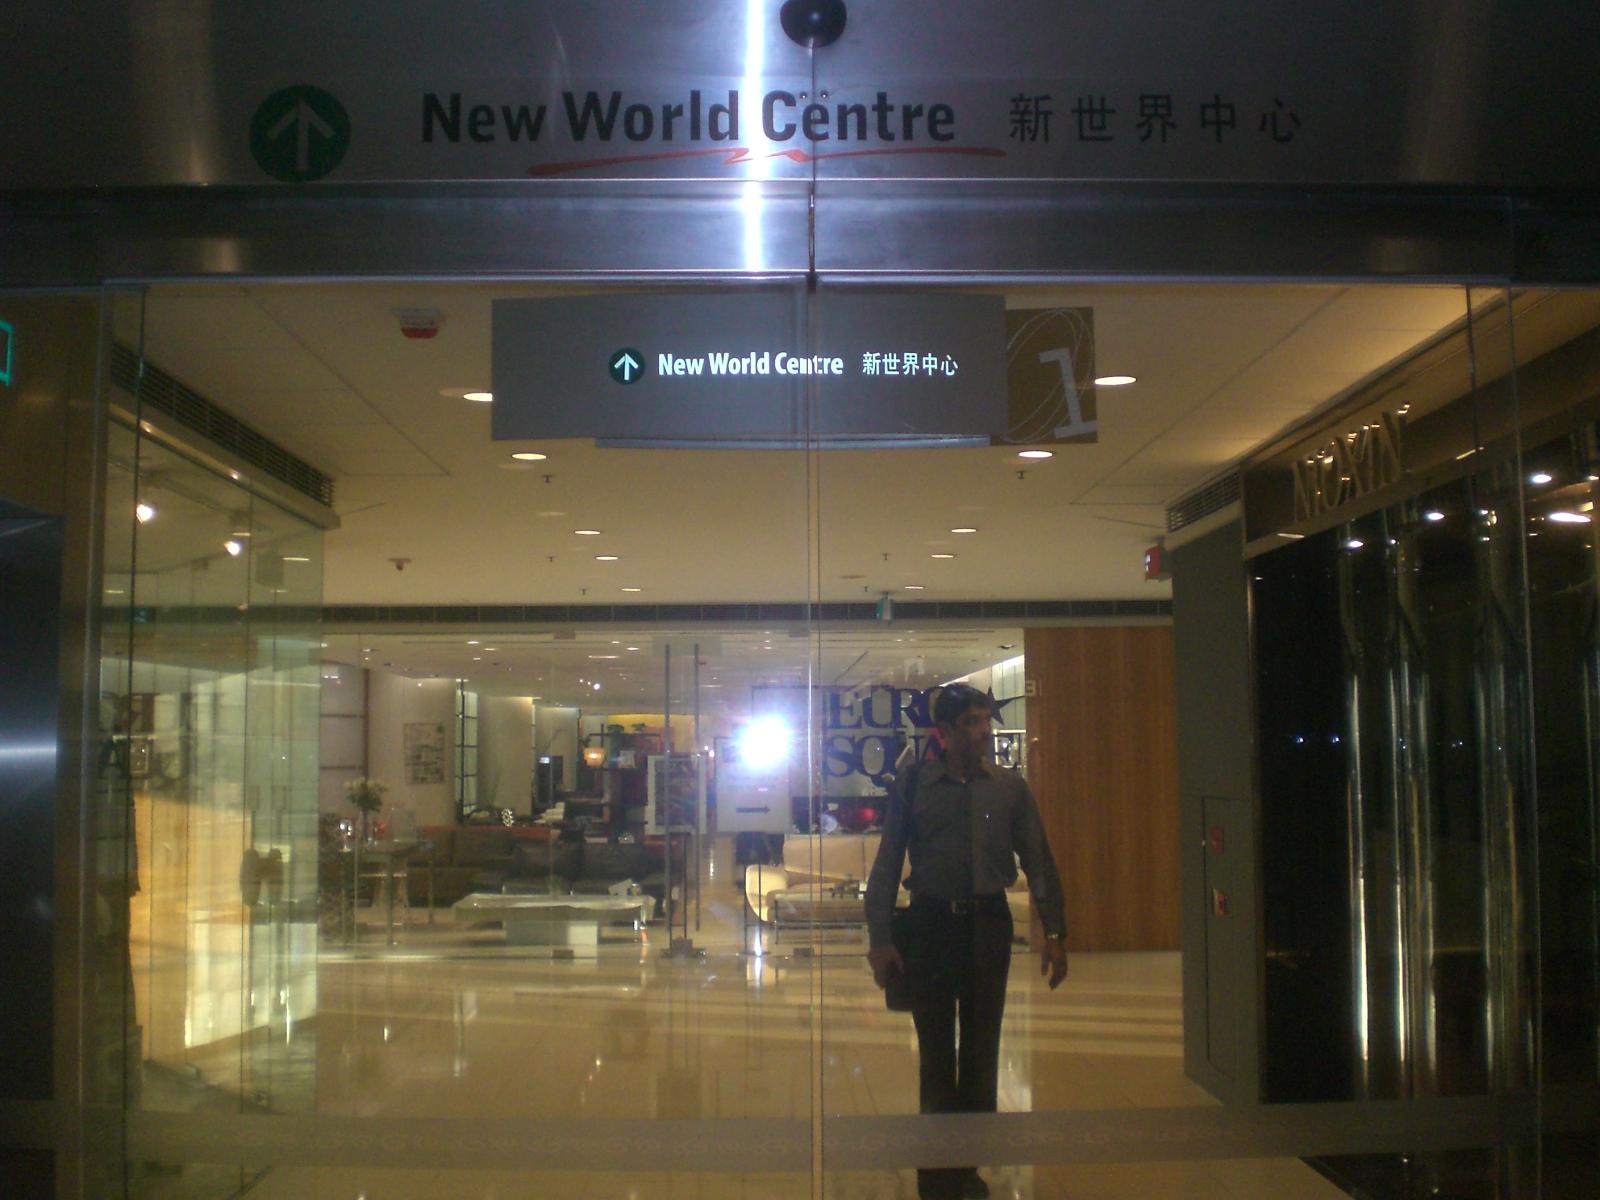 FileHK TST shopping mall InterContinental HK Hotel 香港洲際酒店 lobby door.JPG & File:HK TST shopping mall InterContinental HK Hotel 香港洲際酒店 ...